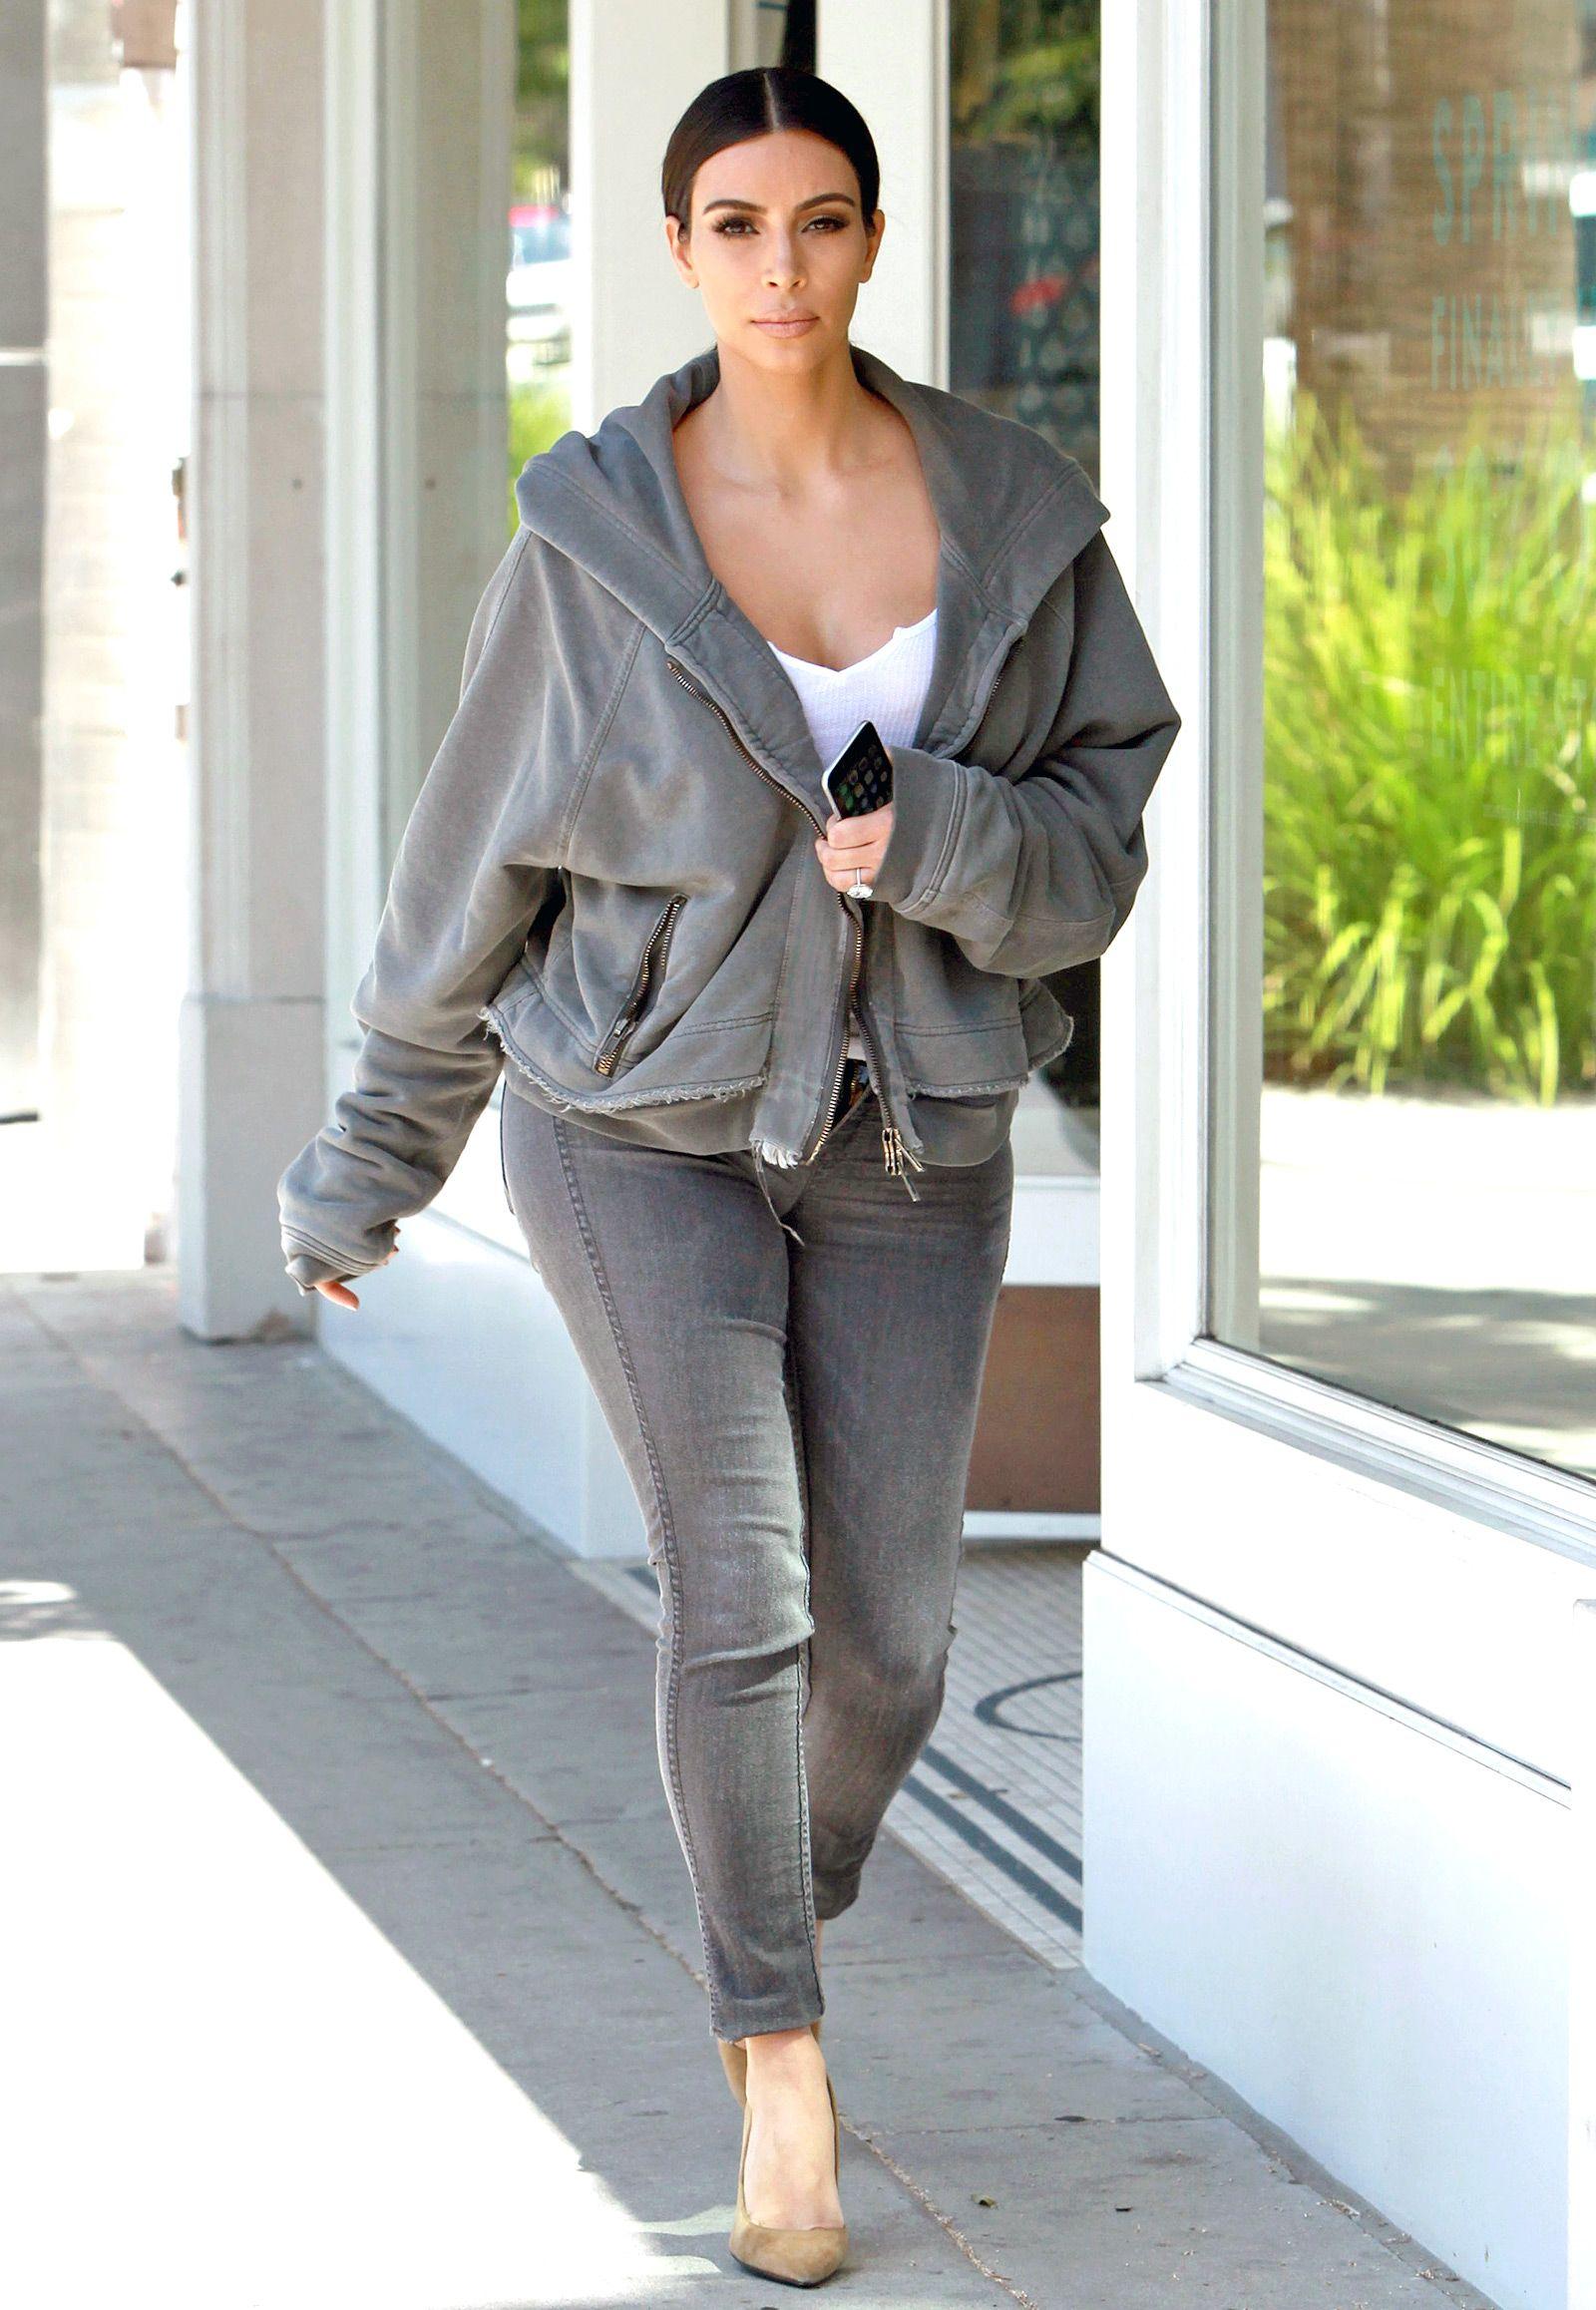 Resultado de imagem para kim kardashian street style 2015